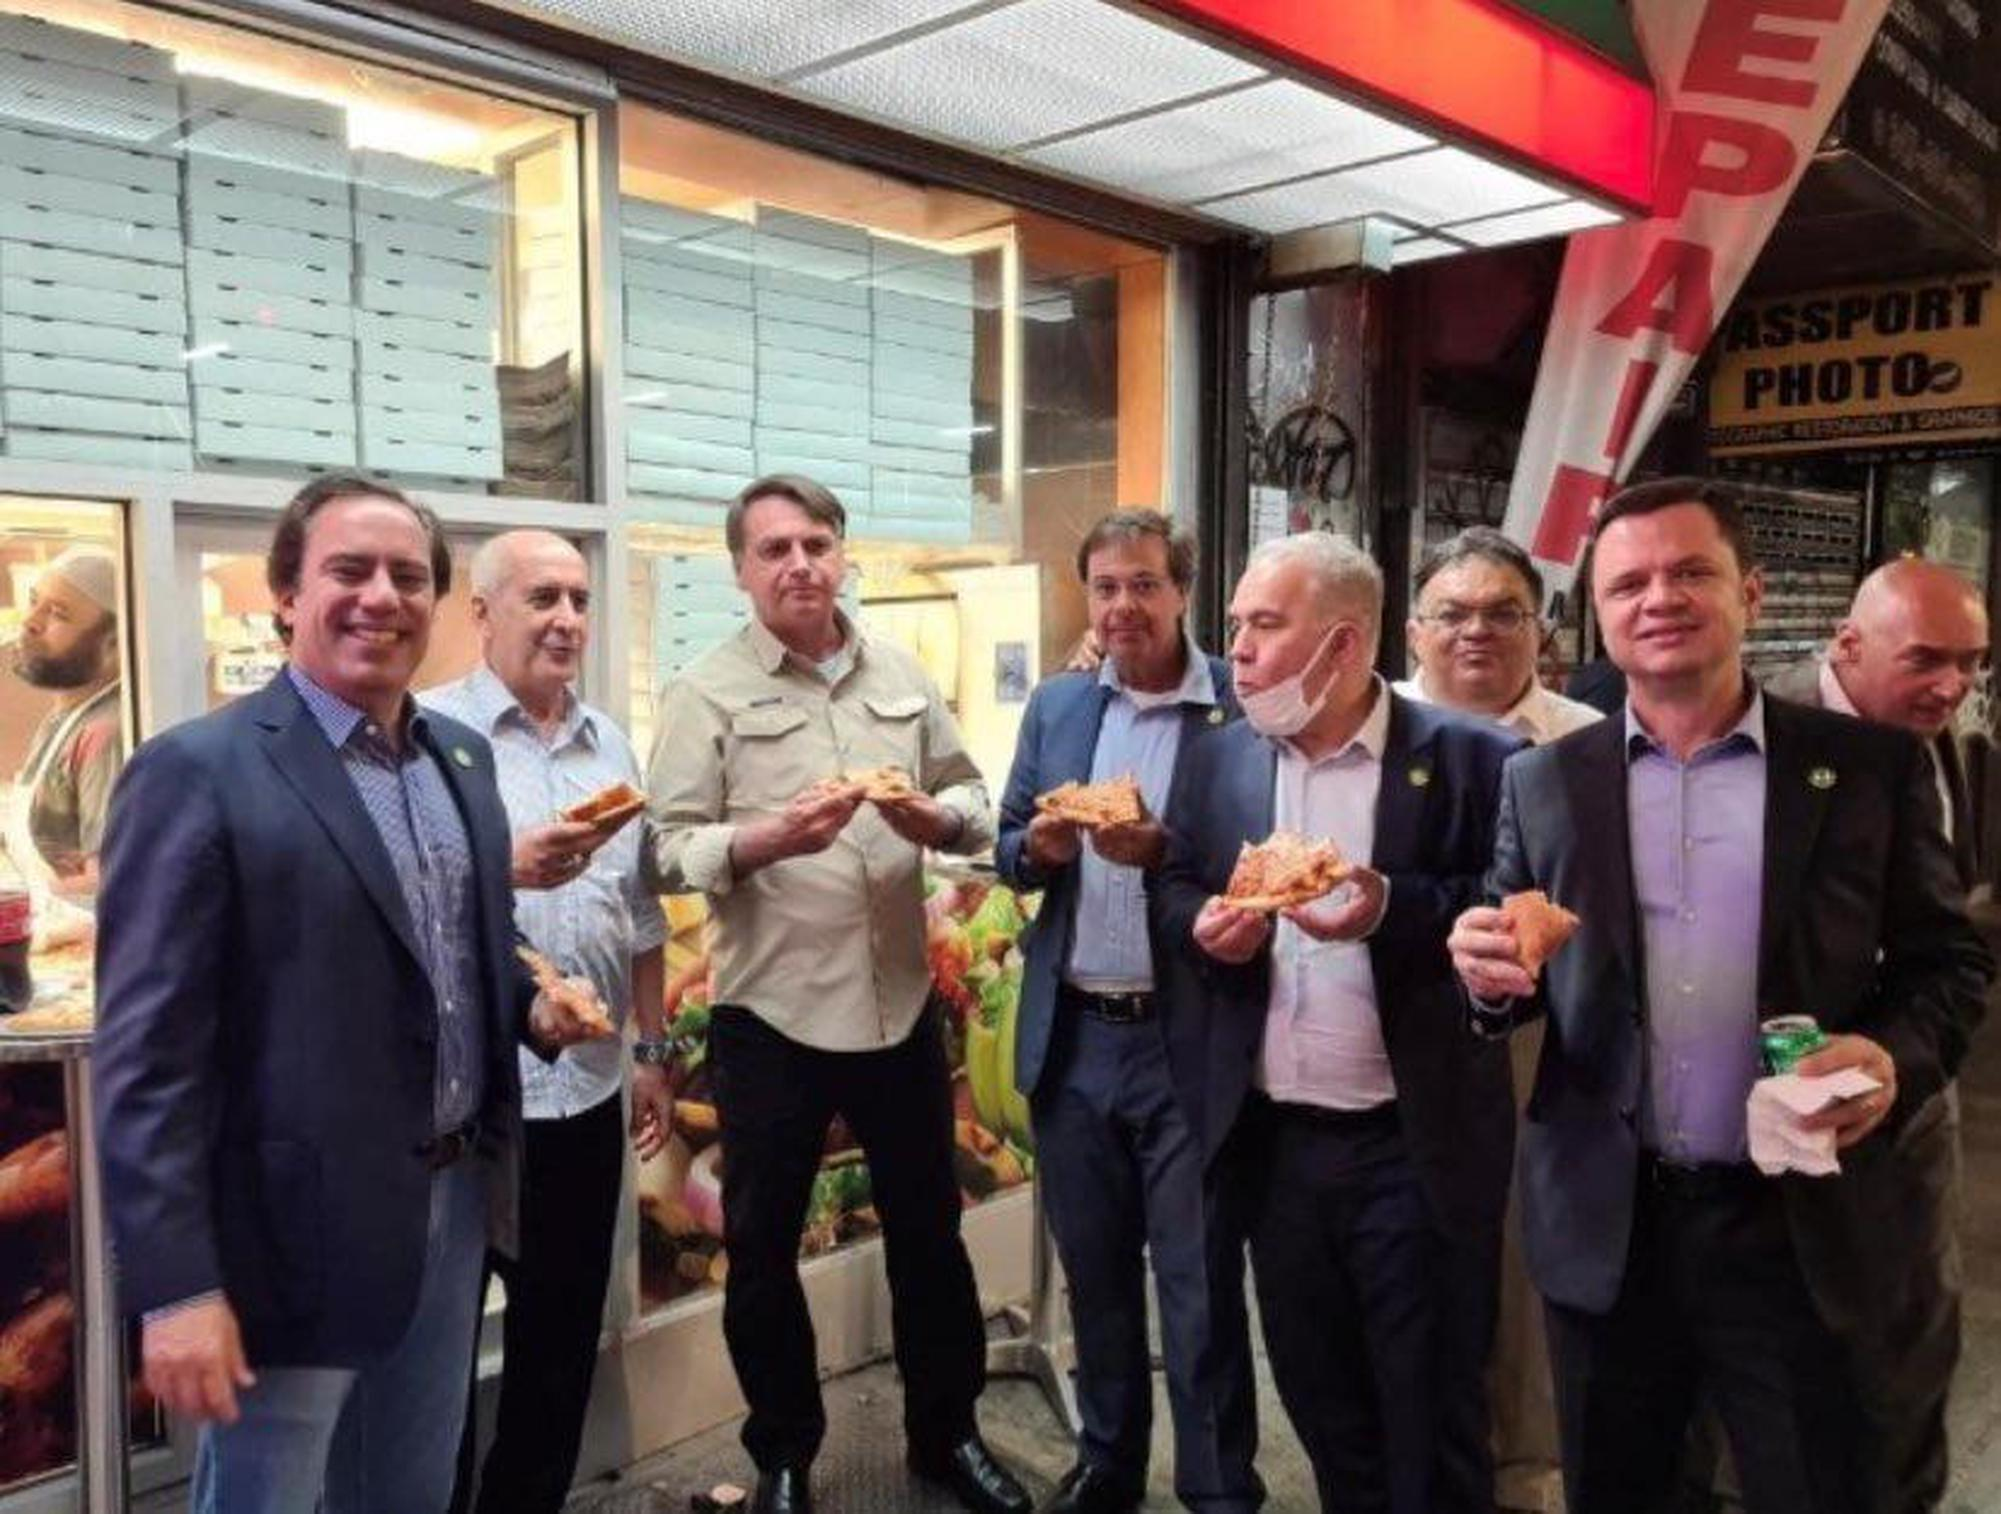 Unvaccinated Bolsonaro forced to eat pizza on NY sidewalk